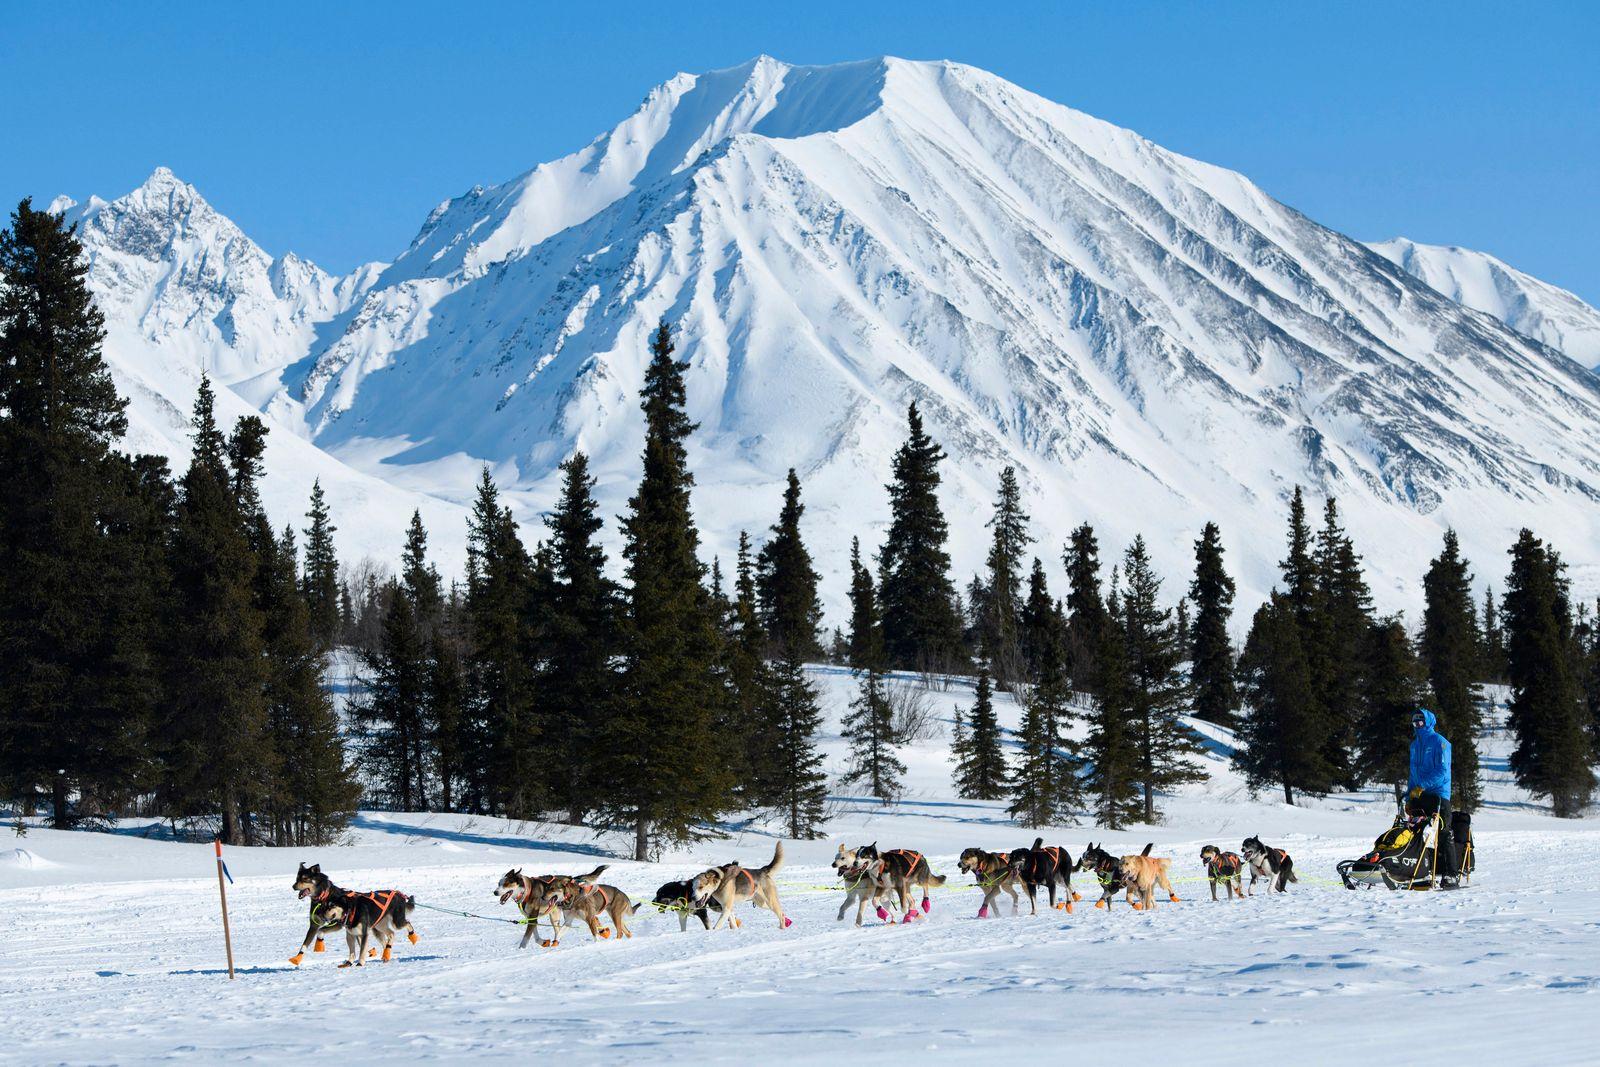 Iditarod Trail Sled Dog Race, Alaska Range, Finger Lake, Rainy Pass, Puntilla Lake